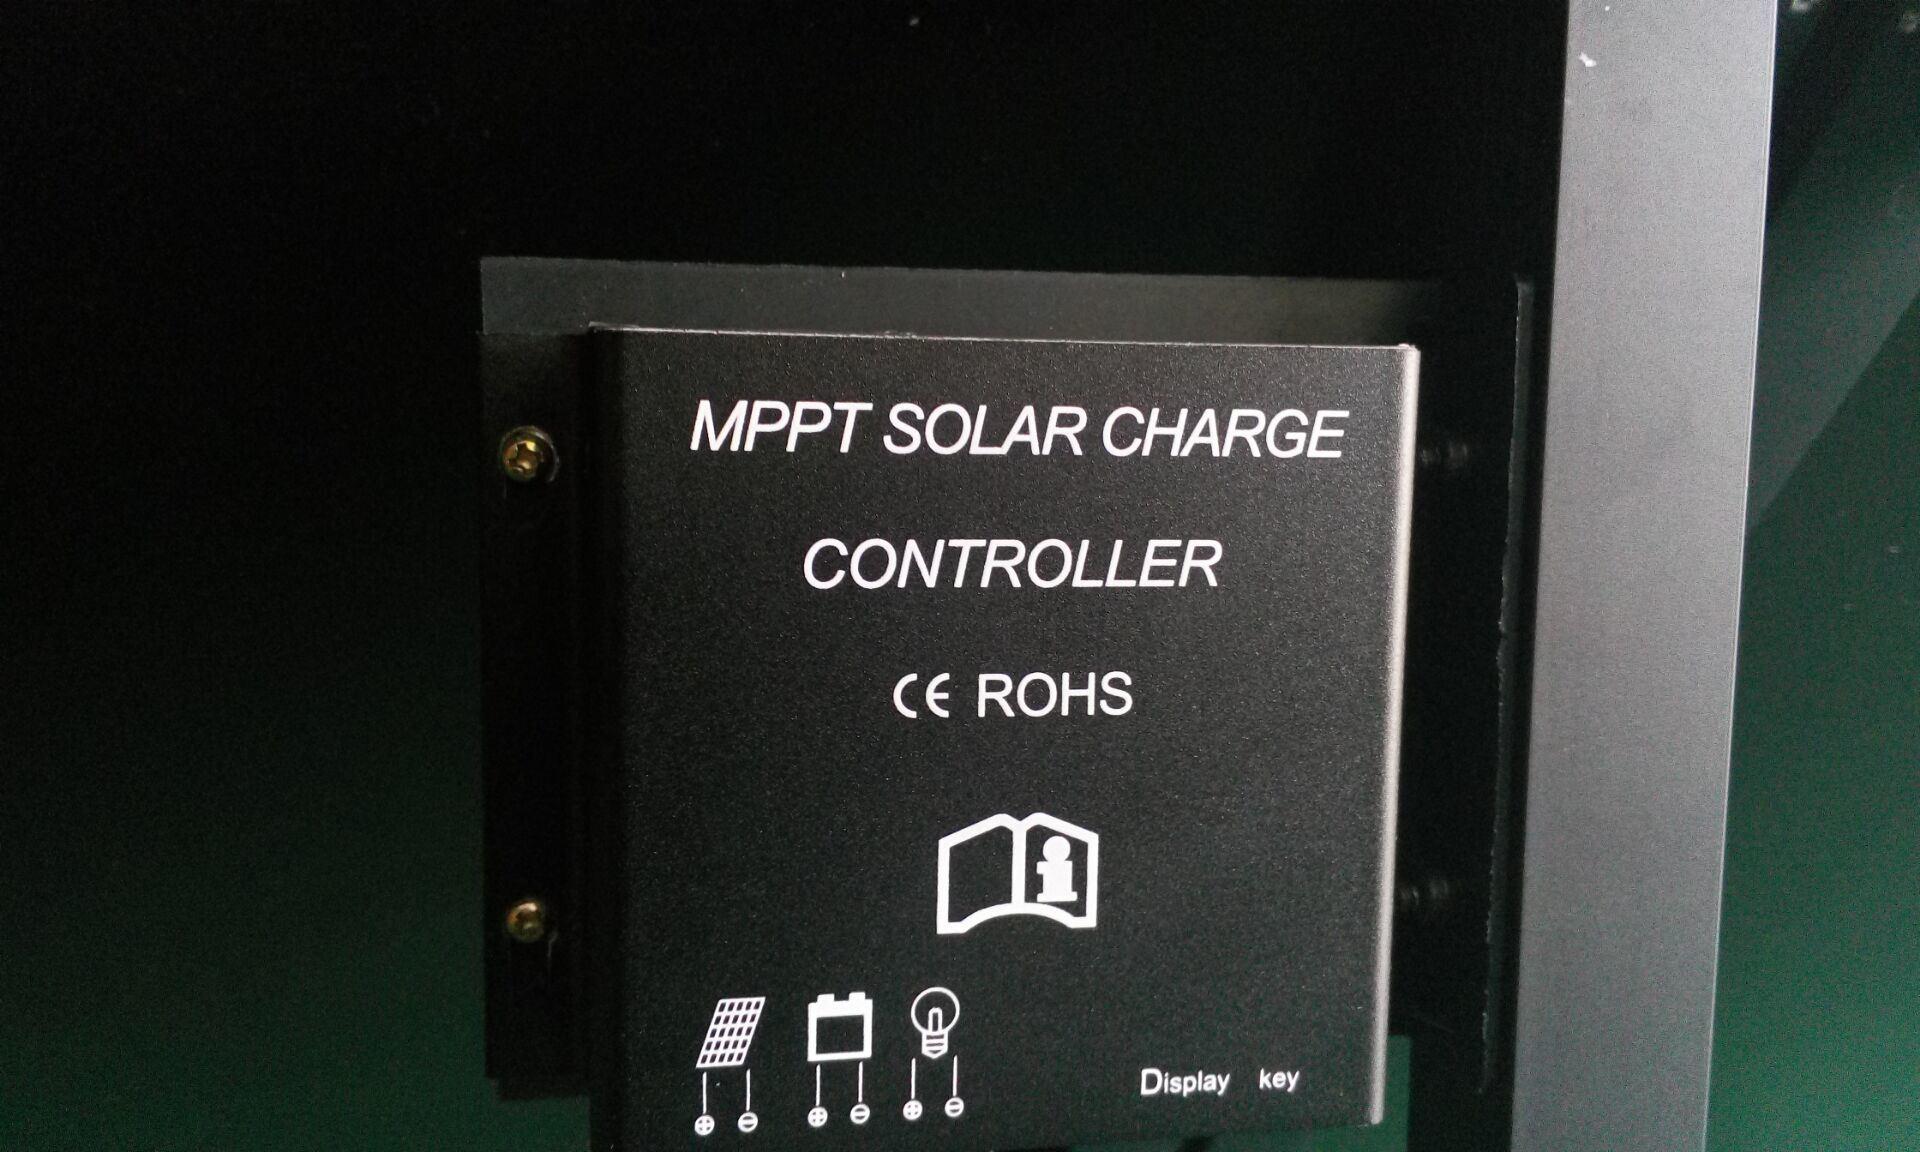 Gp 160W Folding Monocrystalline Solar Panel with Carry Bag